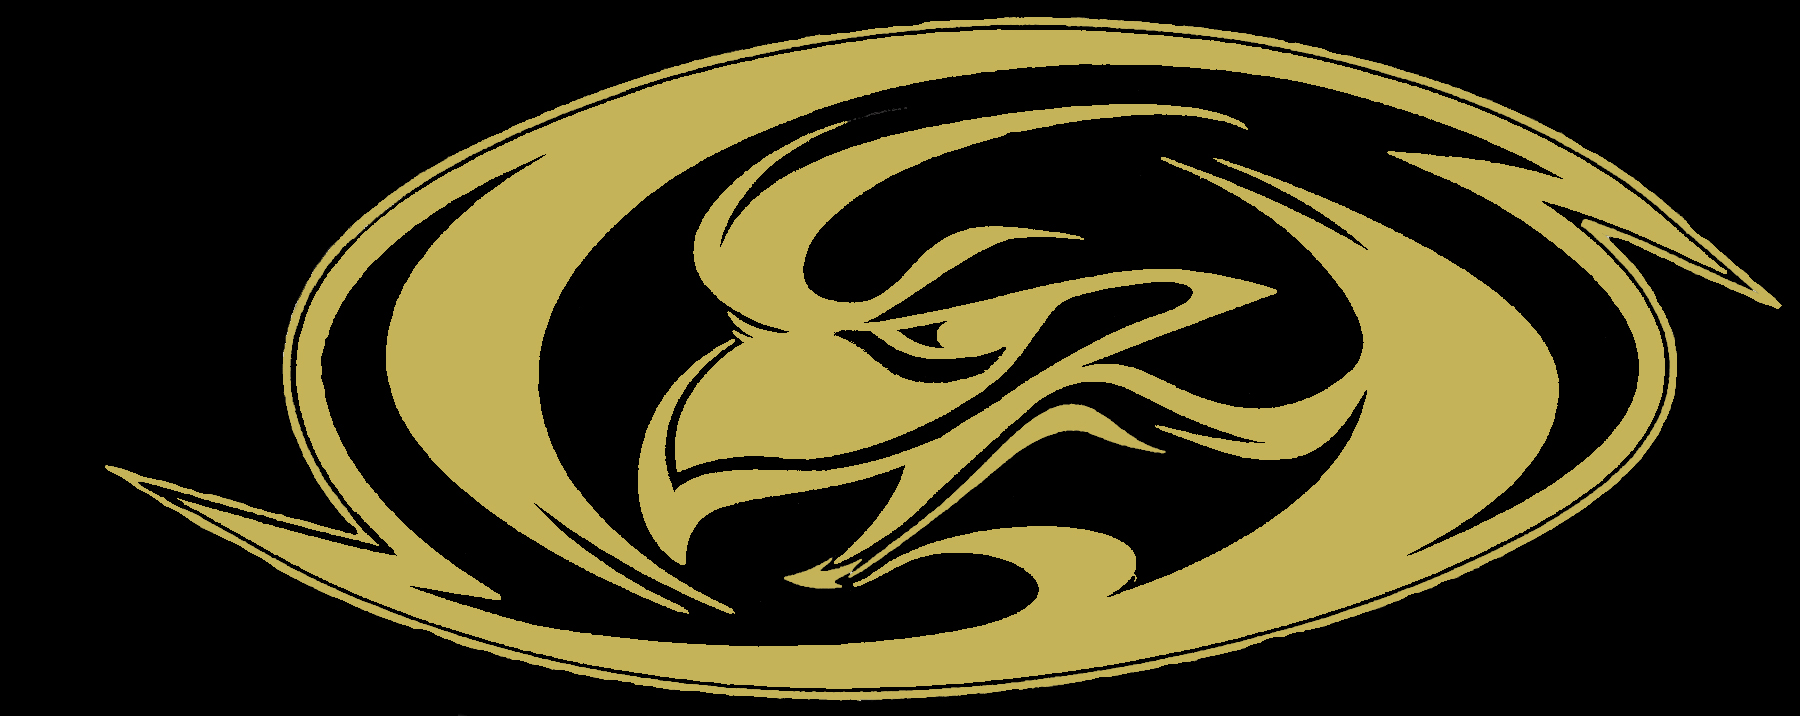 Hawks earn postseason trip behind offensive explosion